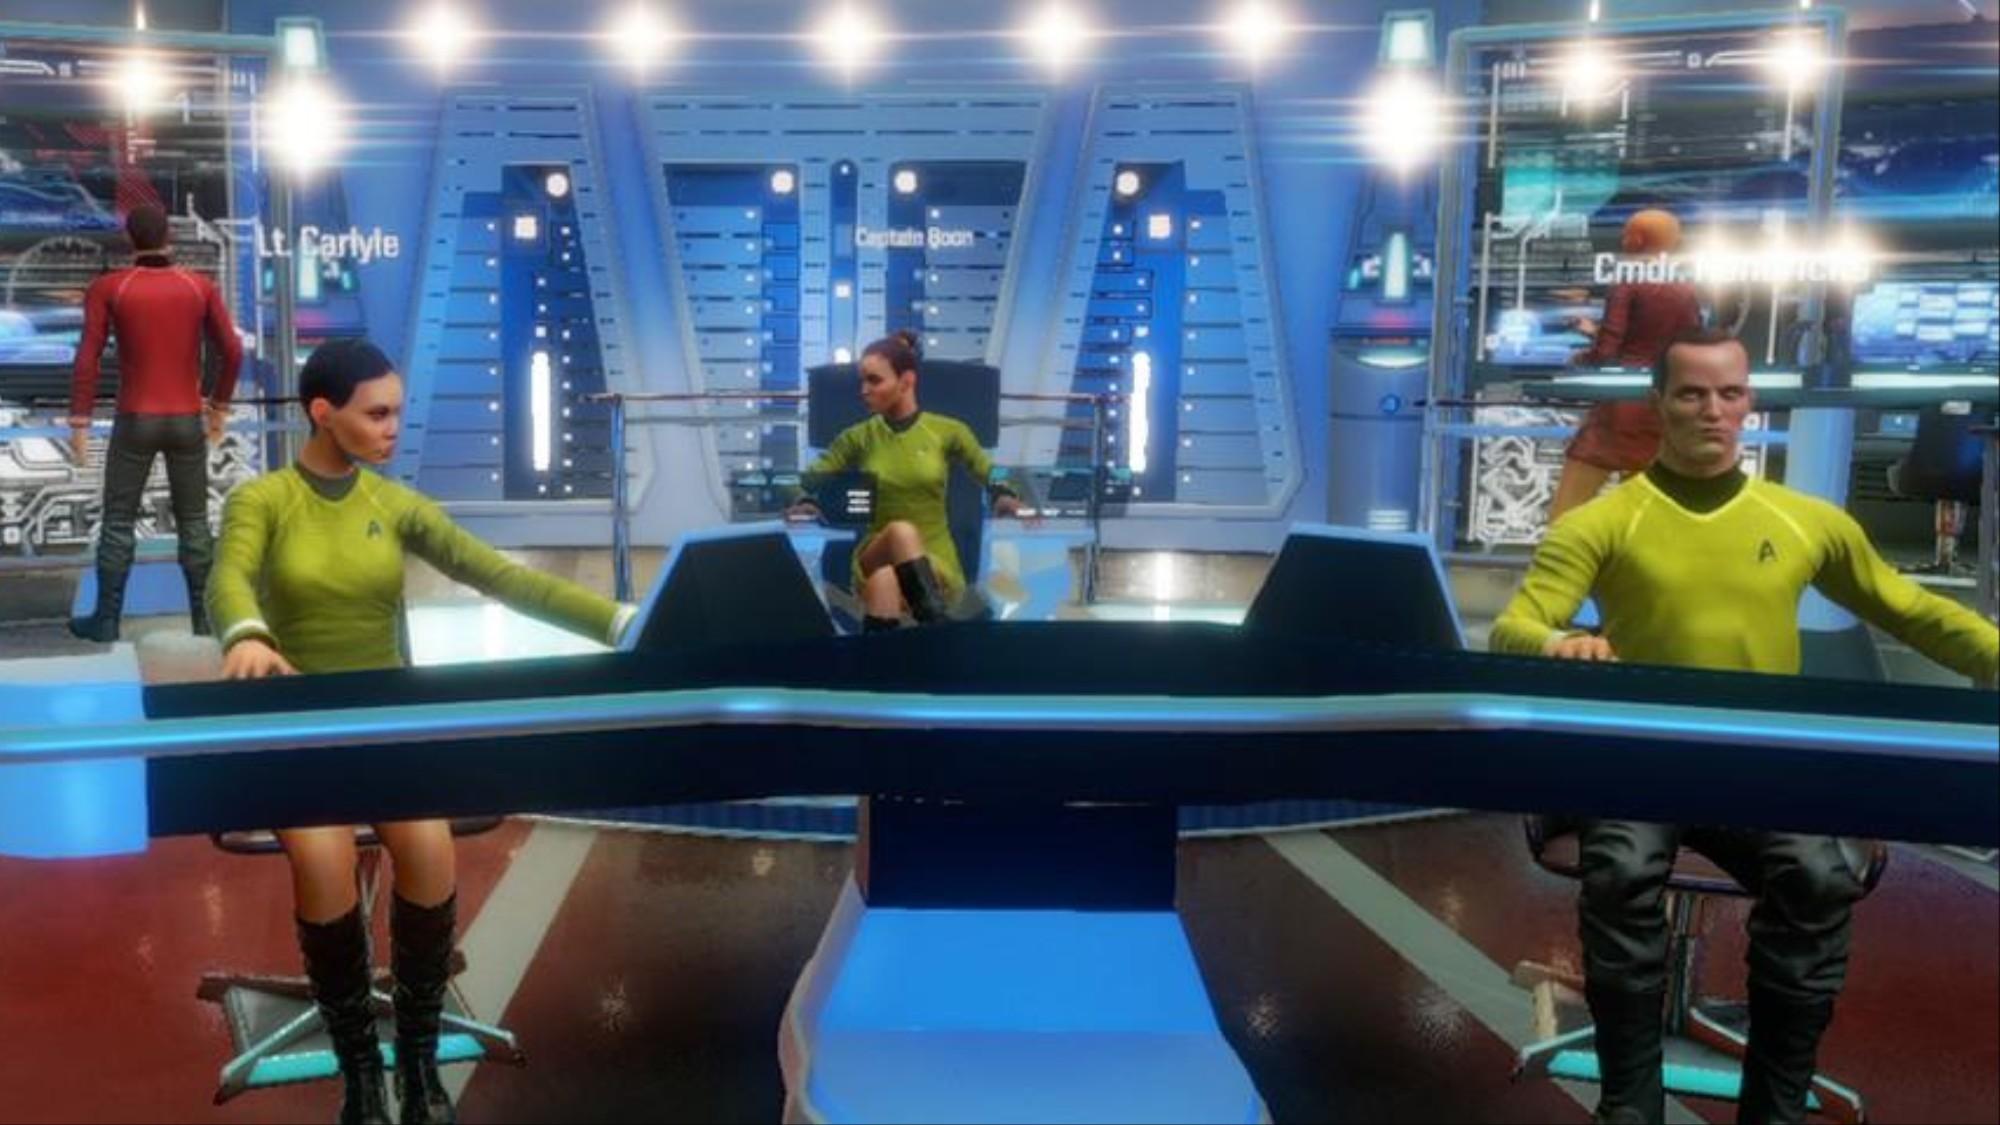 Star Trek: Bridge Crew' Is My Favorite Multiplayer VR